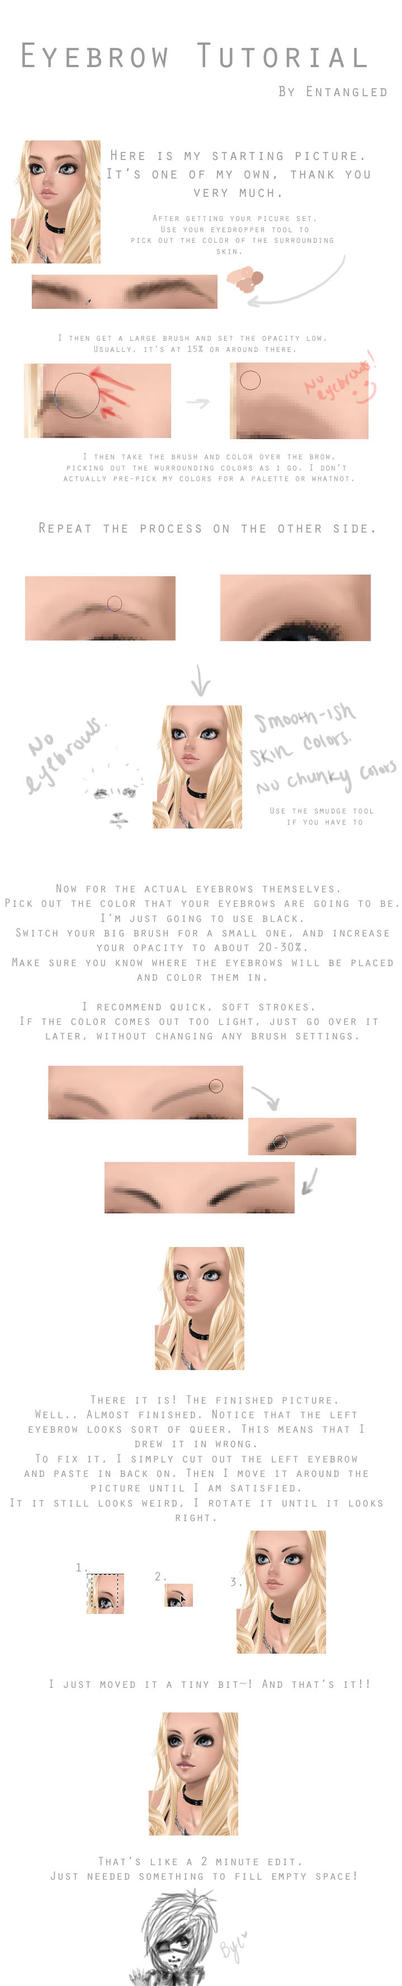 Eyebrow Tutorial by NyappyInTheWorld4